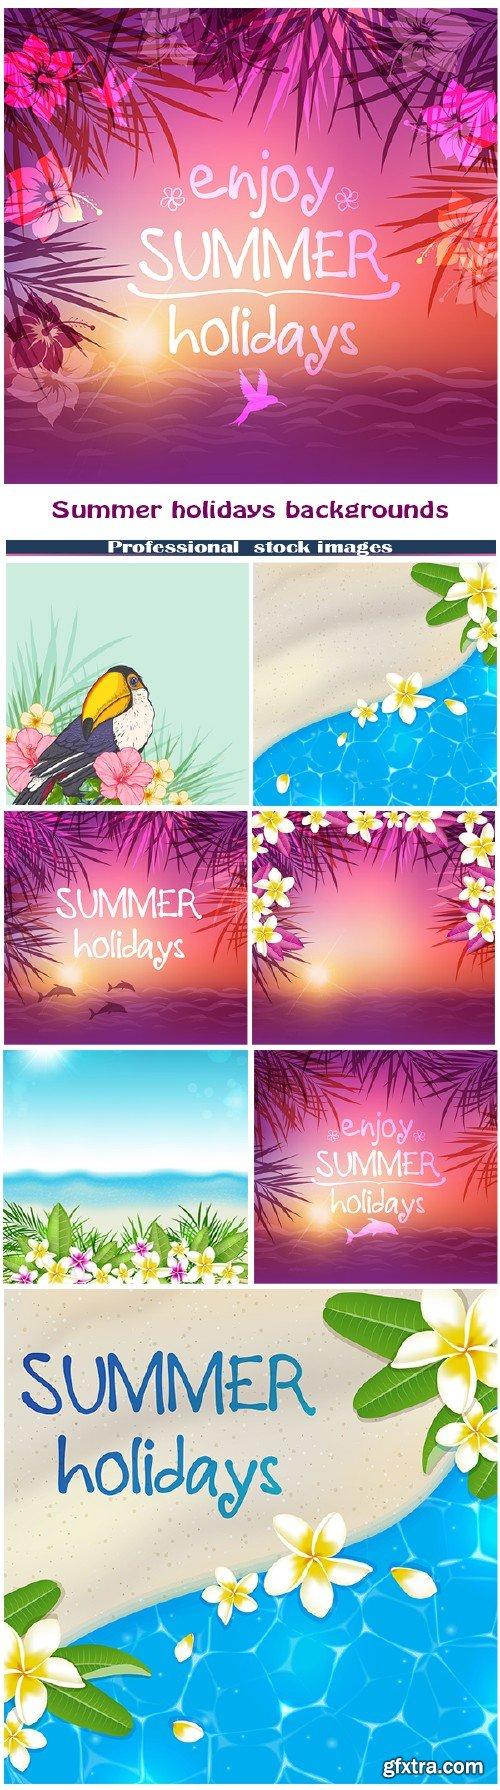 Summer holidays backgrounds #2